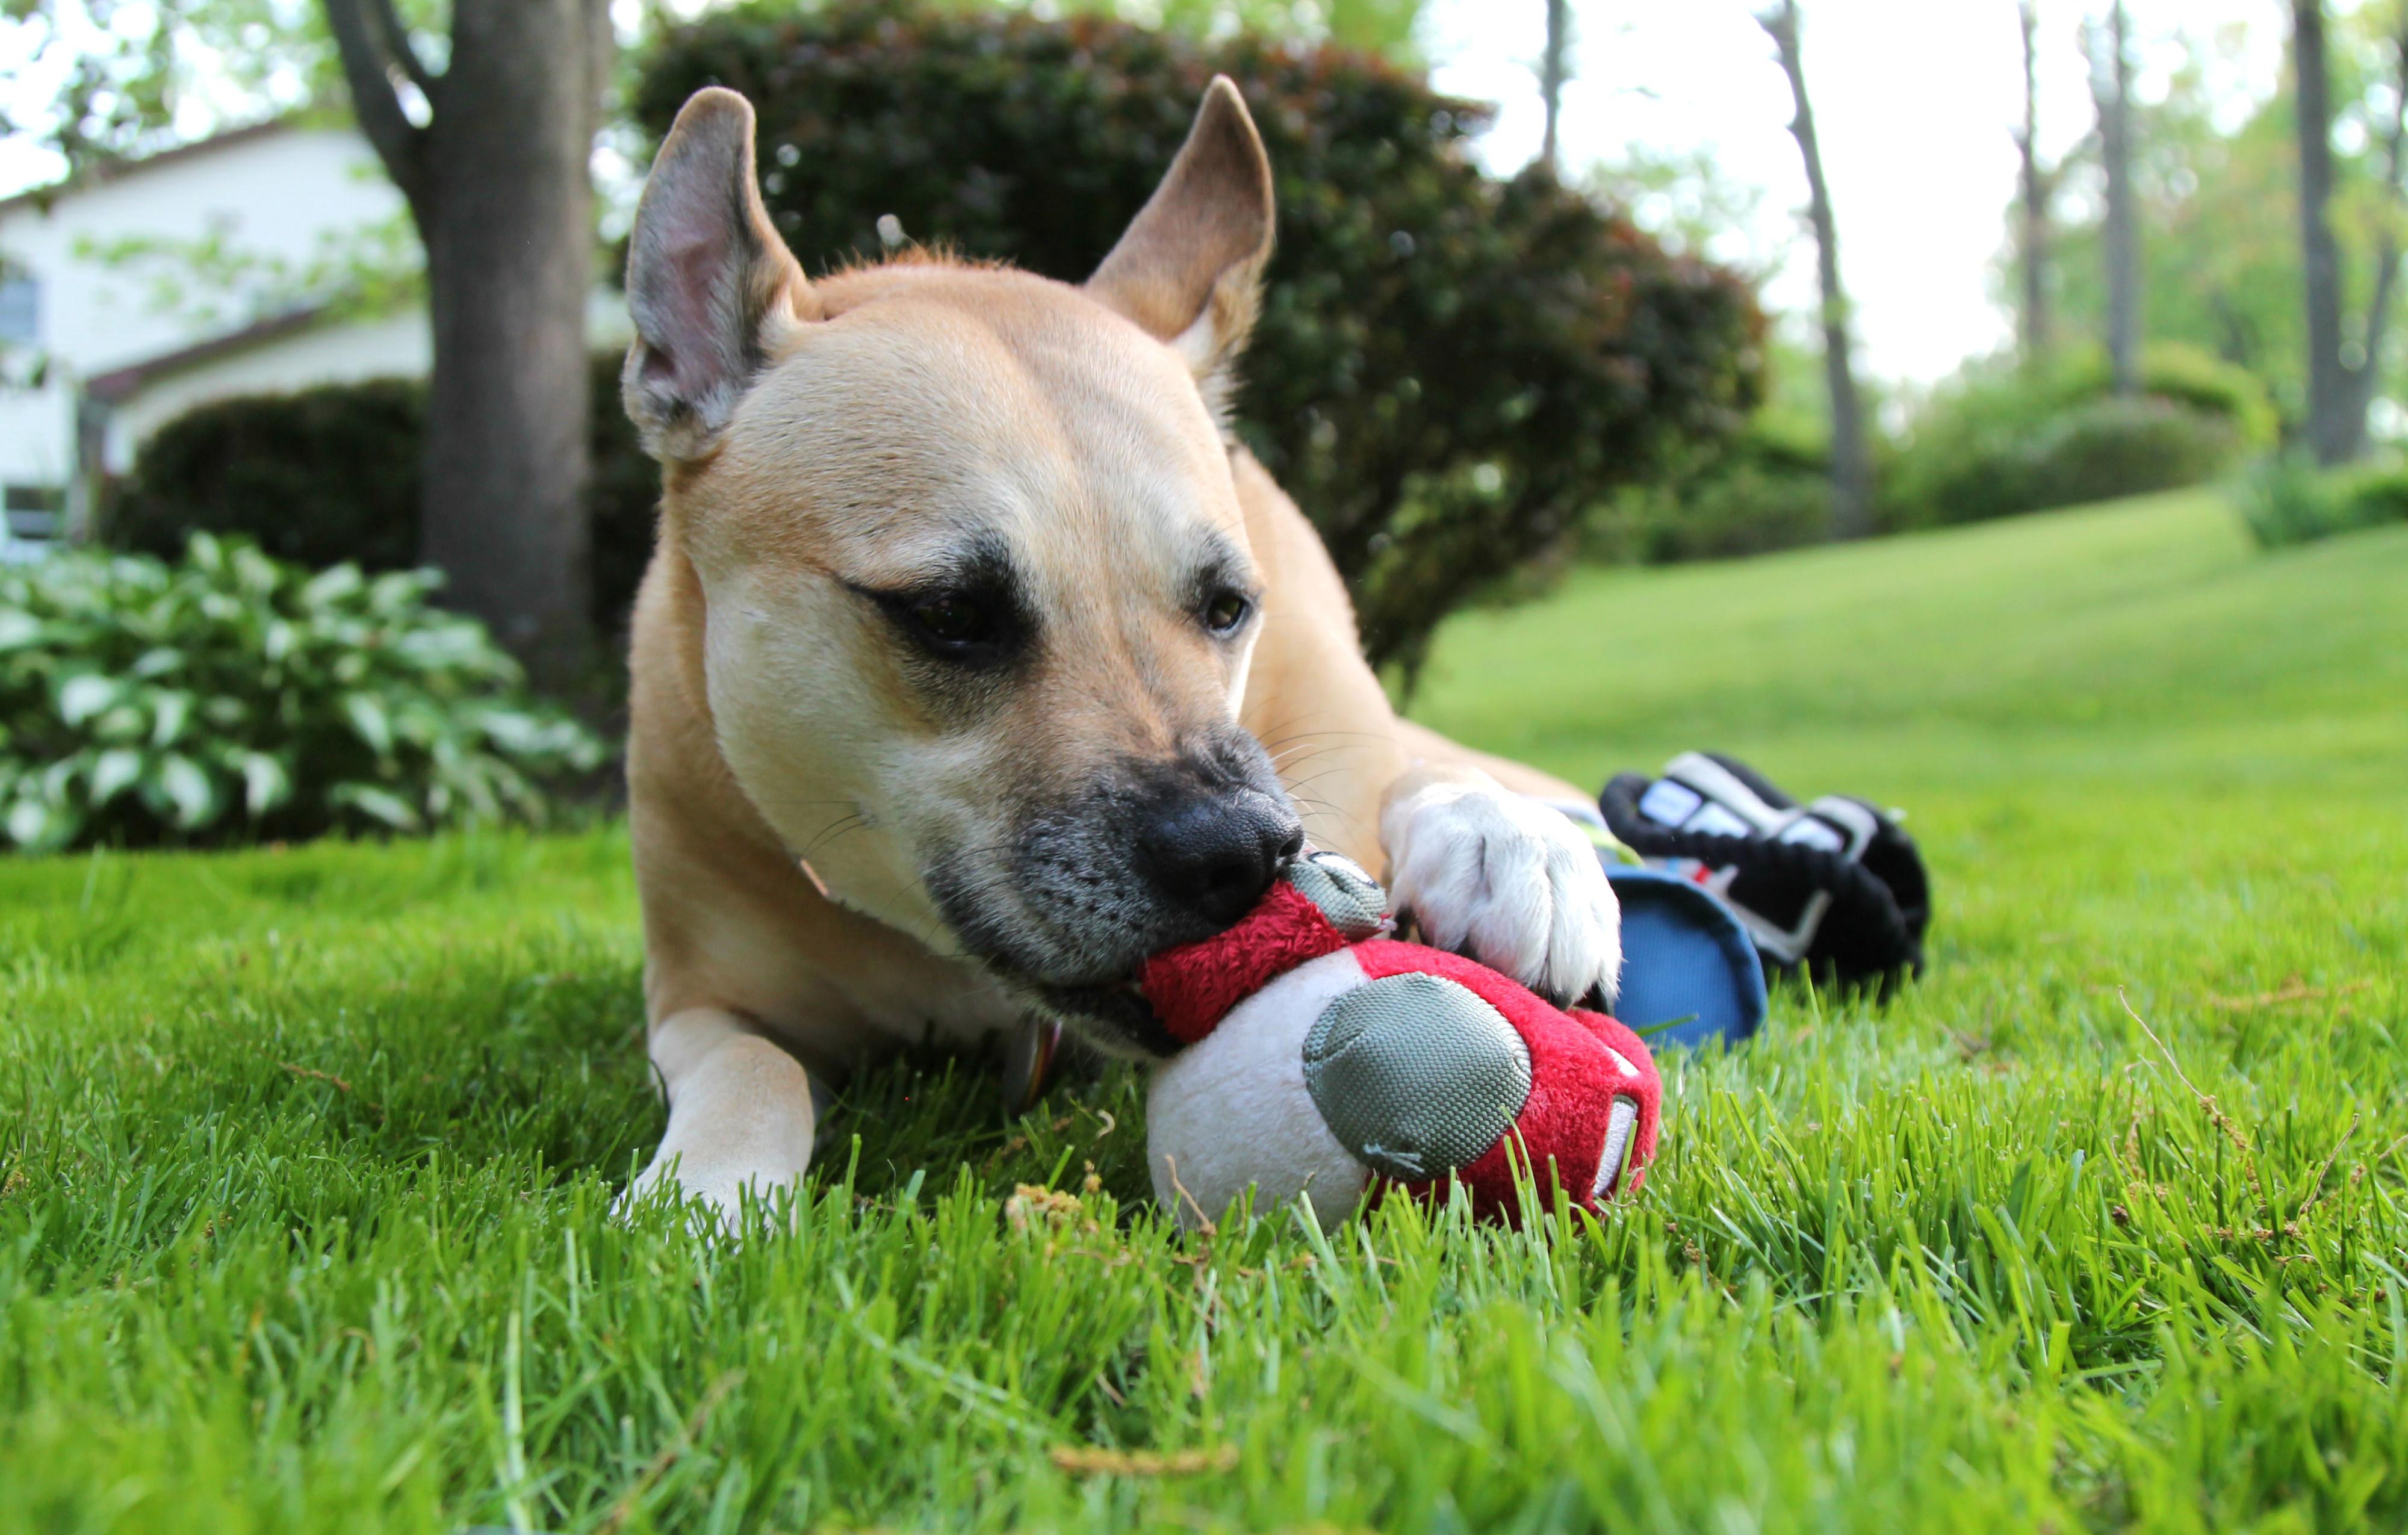 barkshop, aviation, plane, dog toy, love of aviation, plane dog toy, plane toy